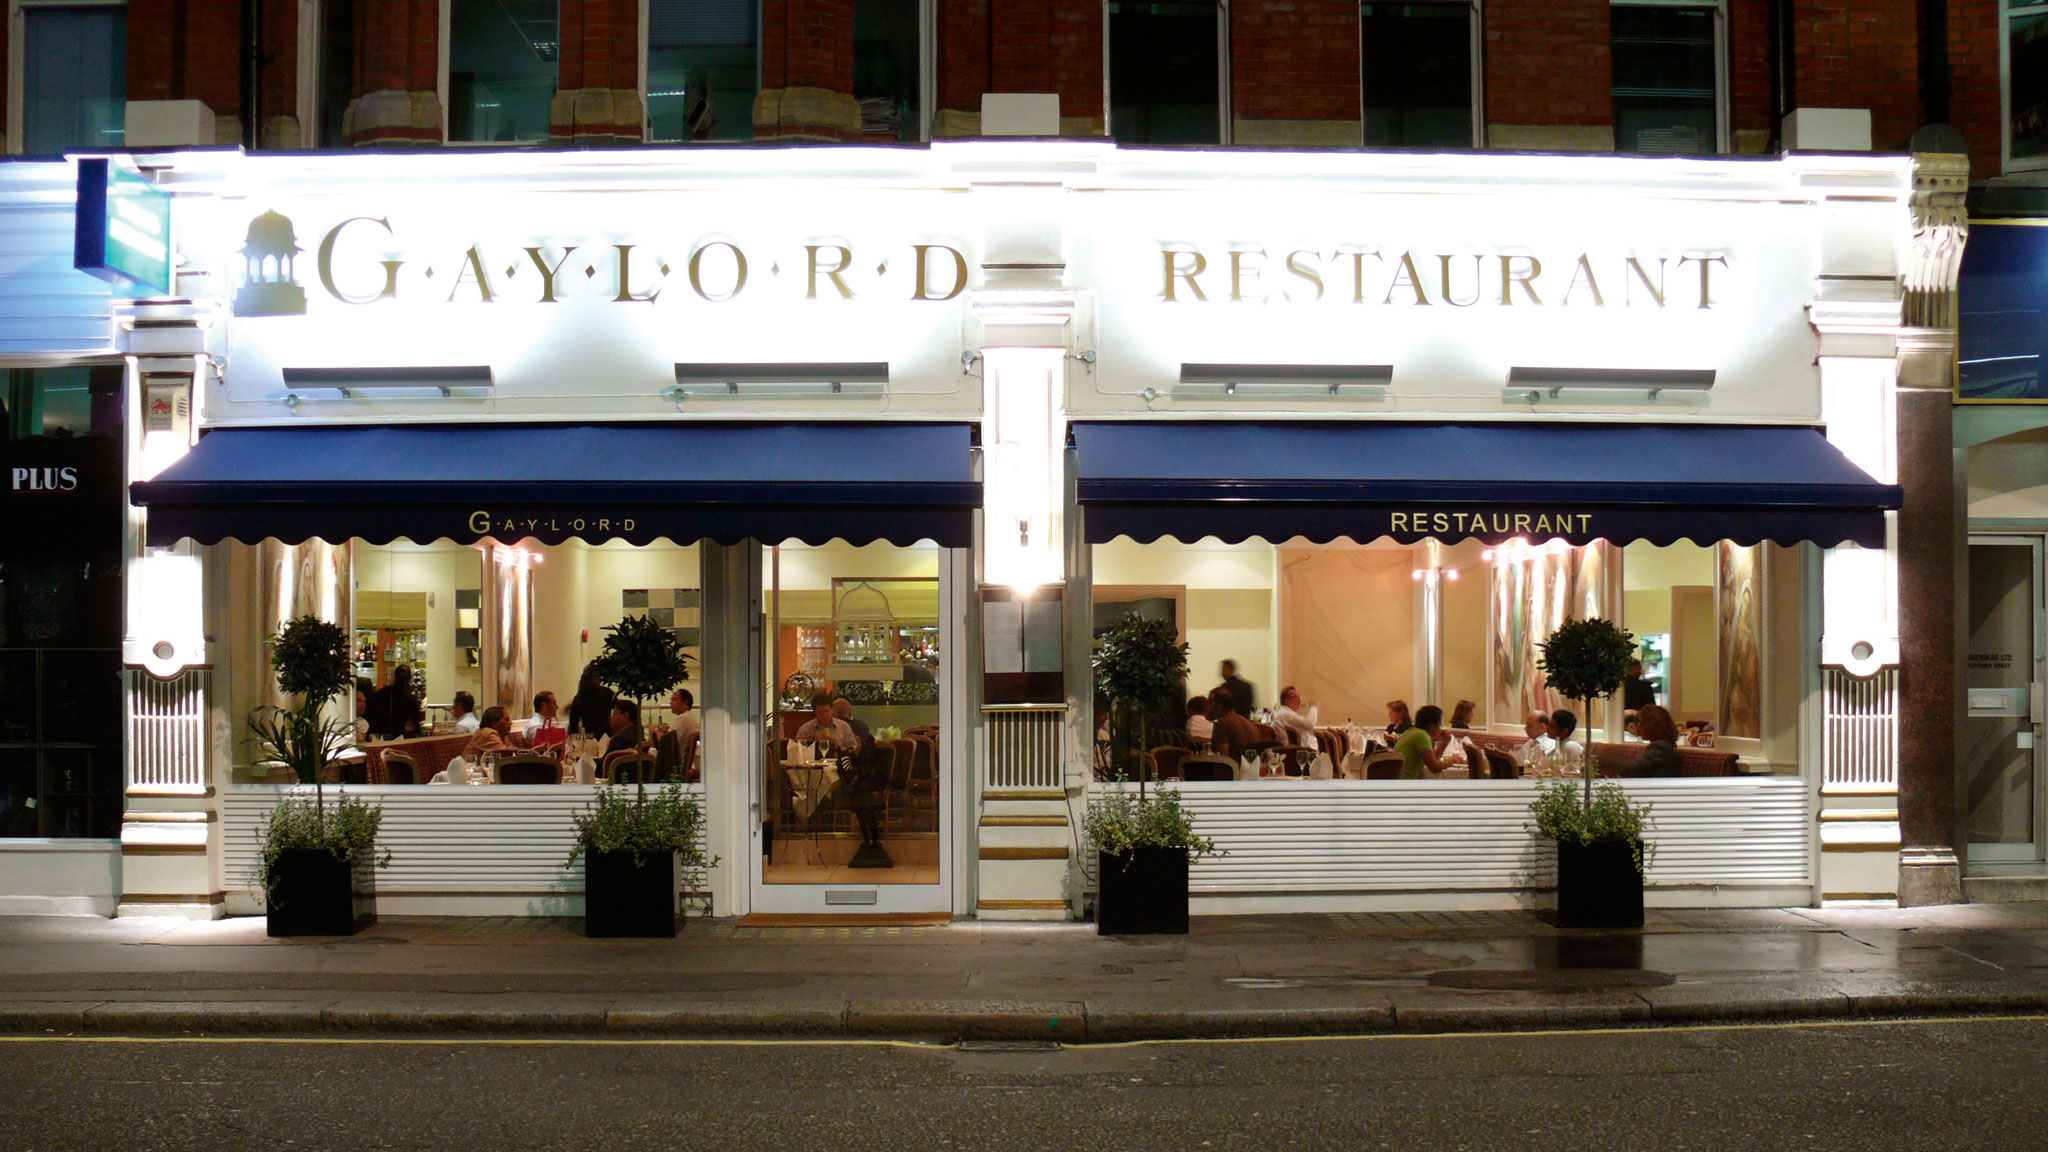 Gaylord London Restaurant